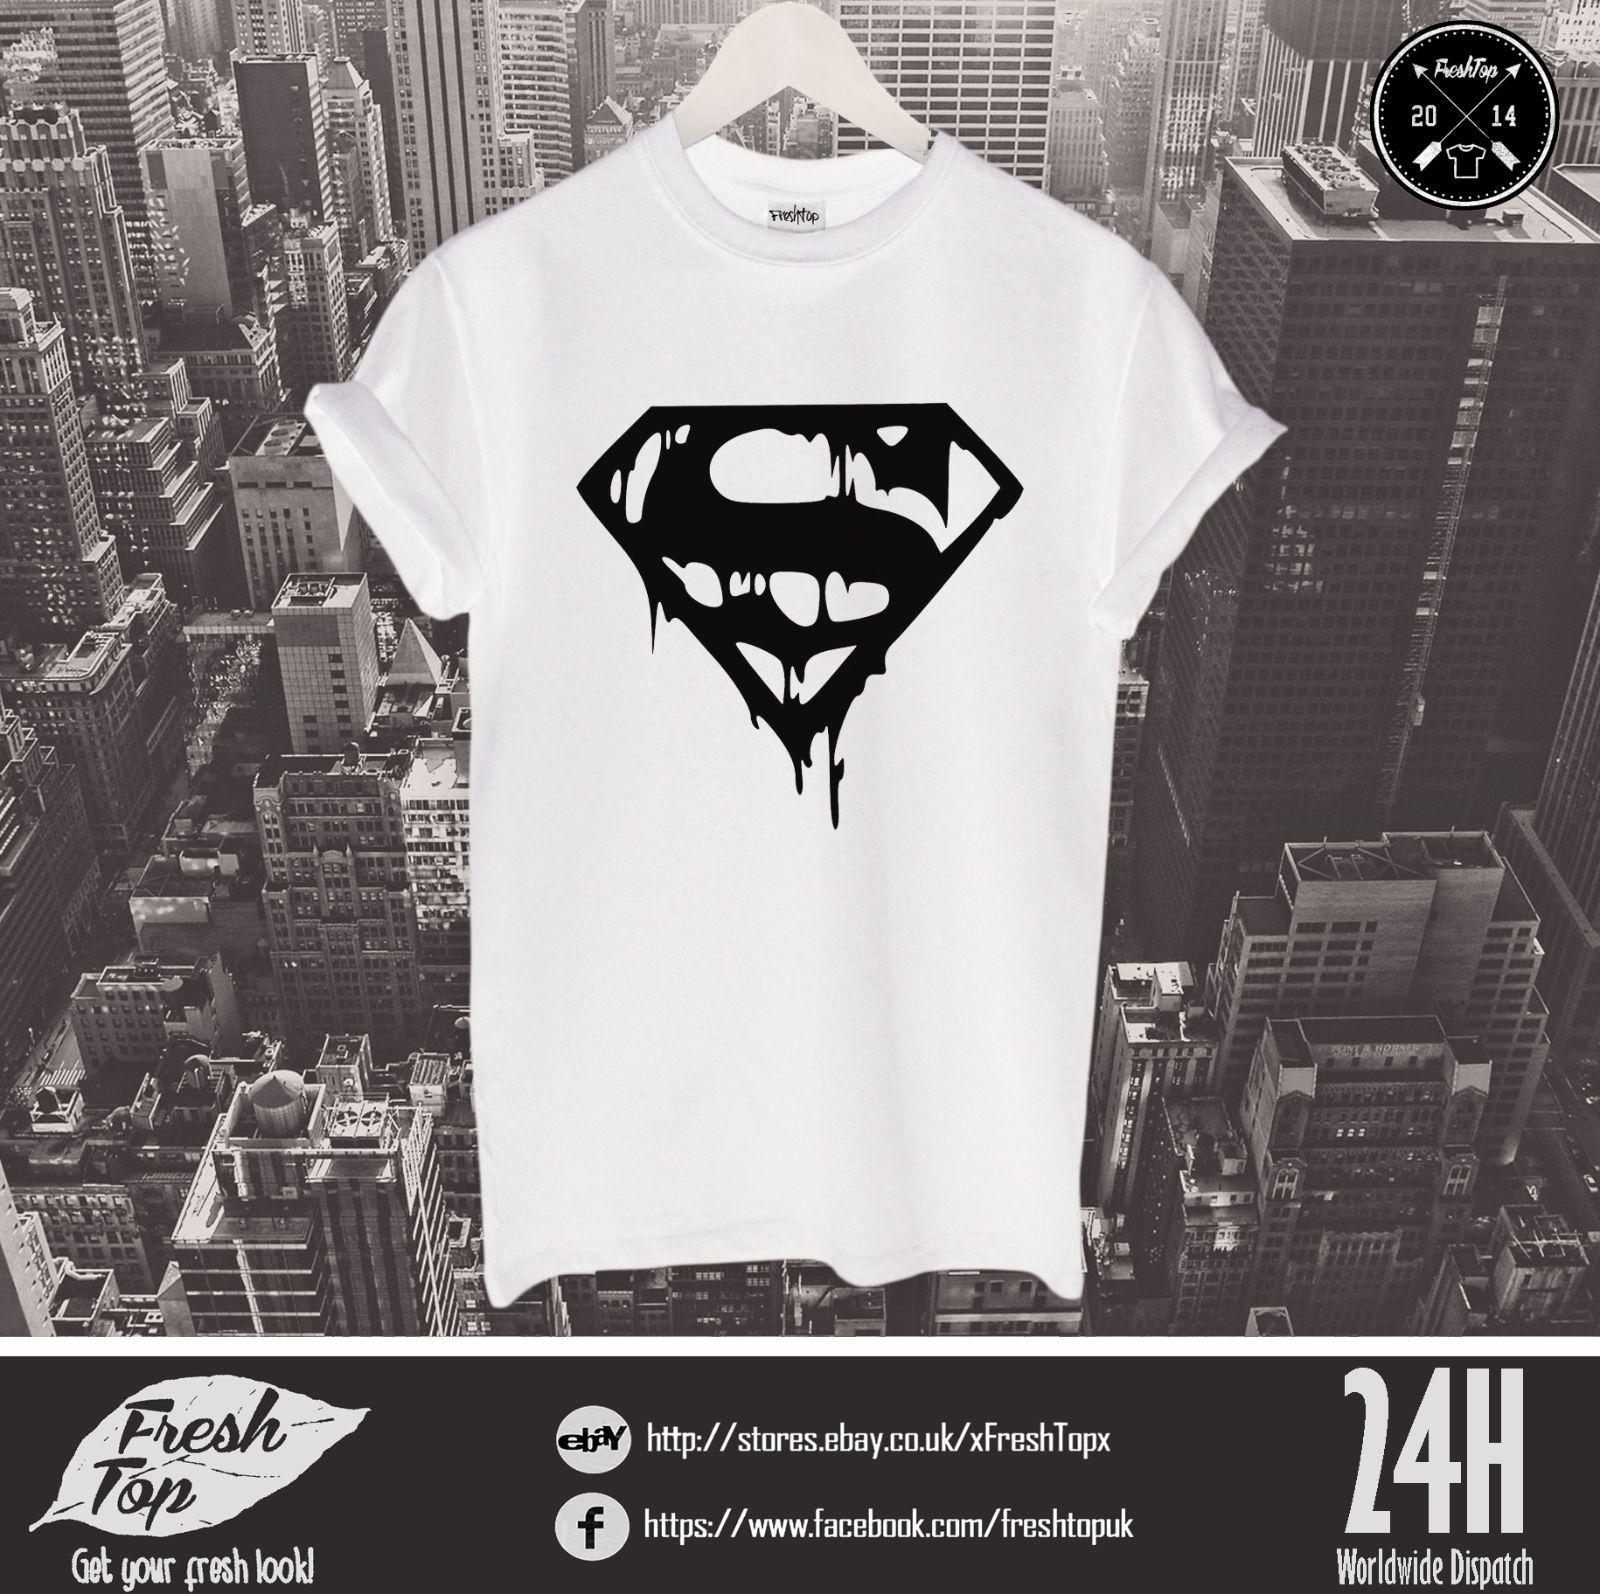 Superman T Shirt Top Dope Logo DC Comics Superhero VS Clark Kent Gift Mens  2018 Fashionable Brand 100%cotton Printed Round Order T Shirts Quality T  Shirts ... cf6f60a3ff